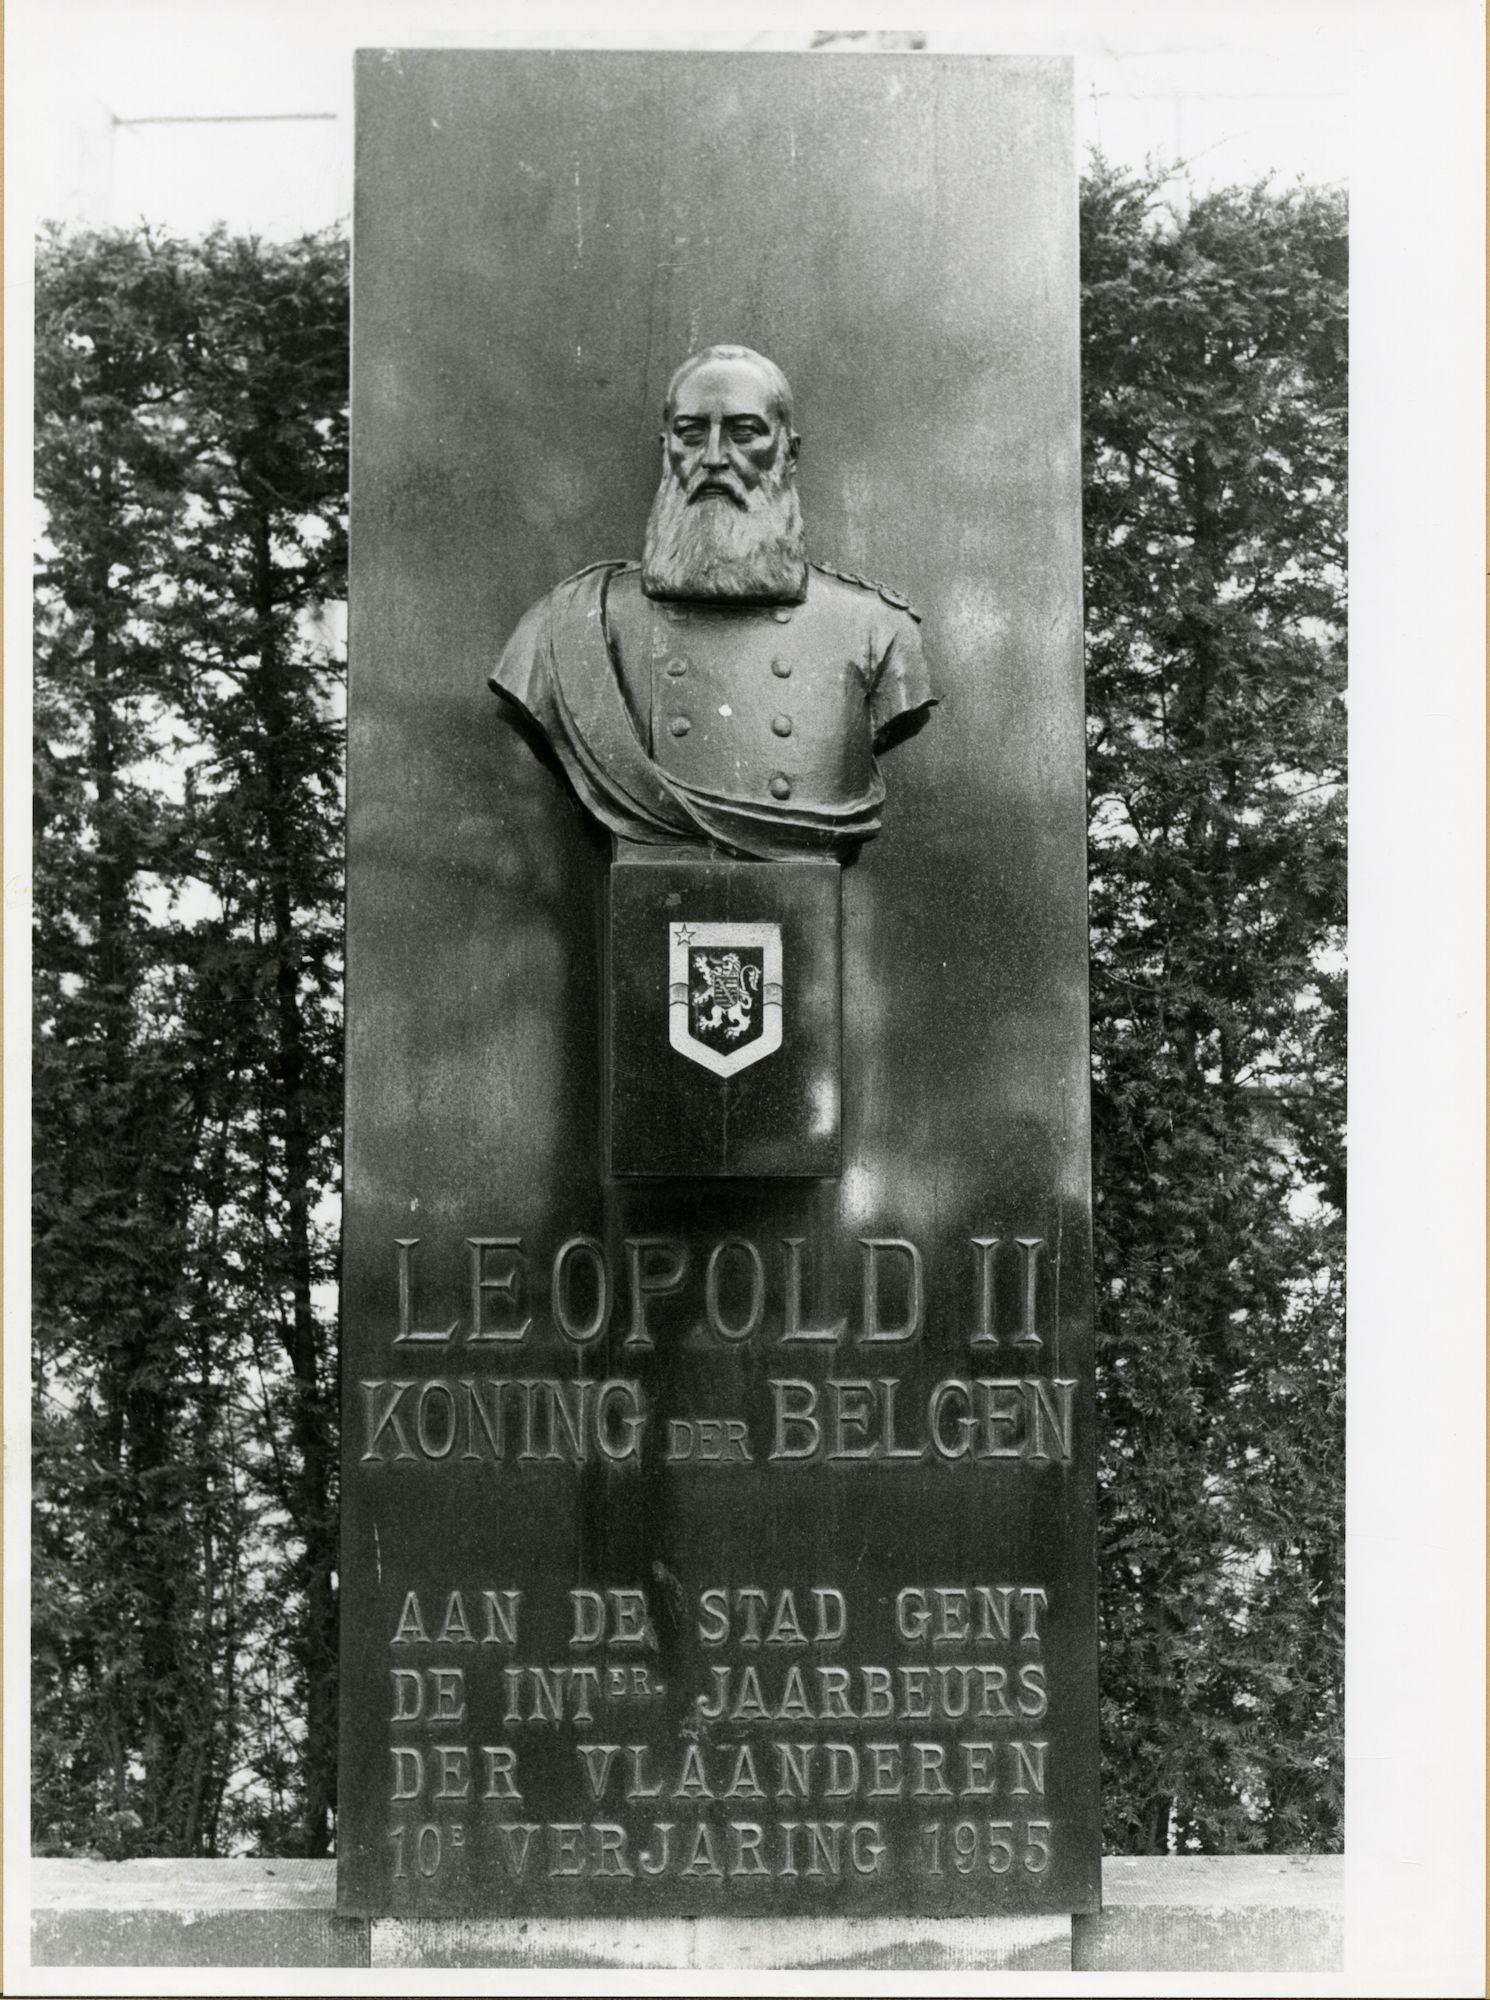 Gent: Franklin Rooseveltlaan: monument: Koning Leopold II